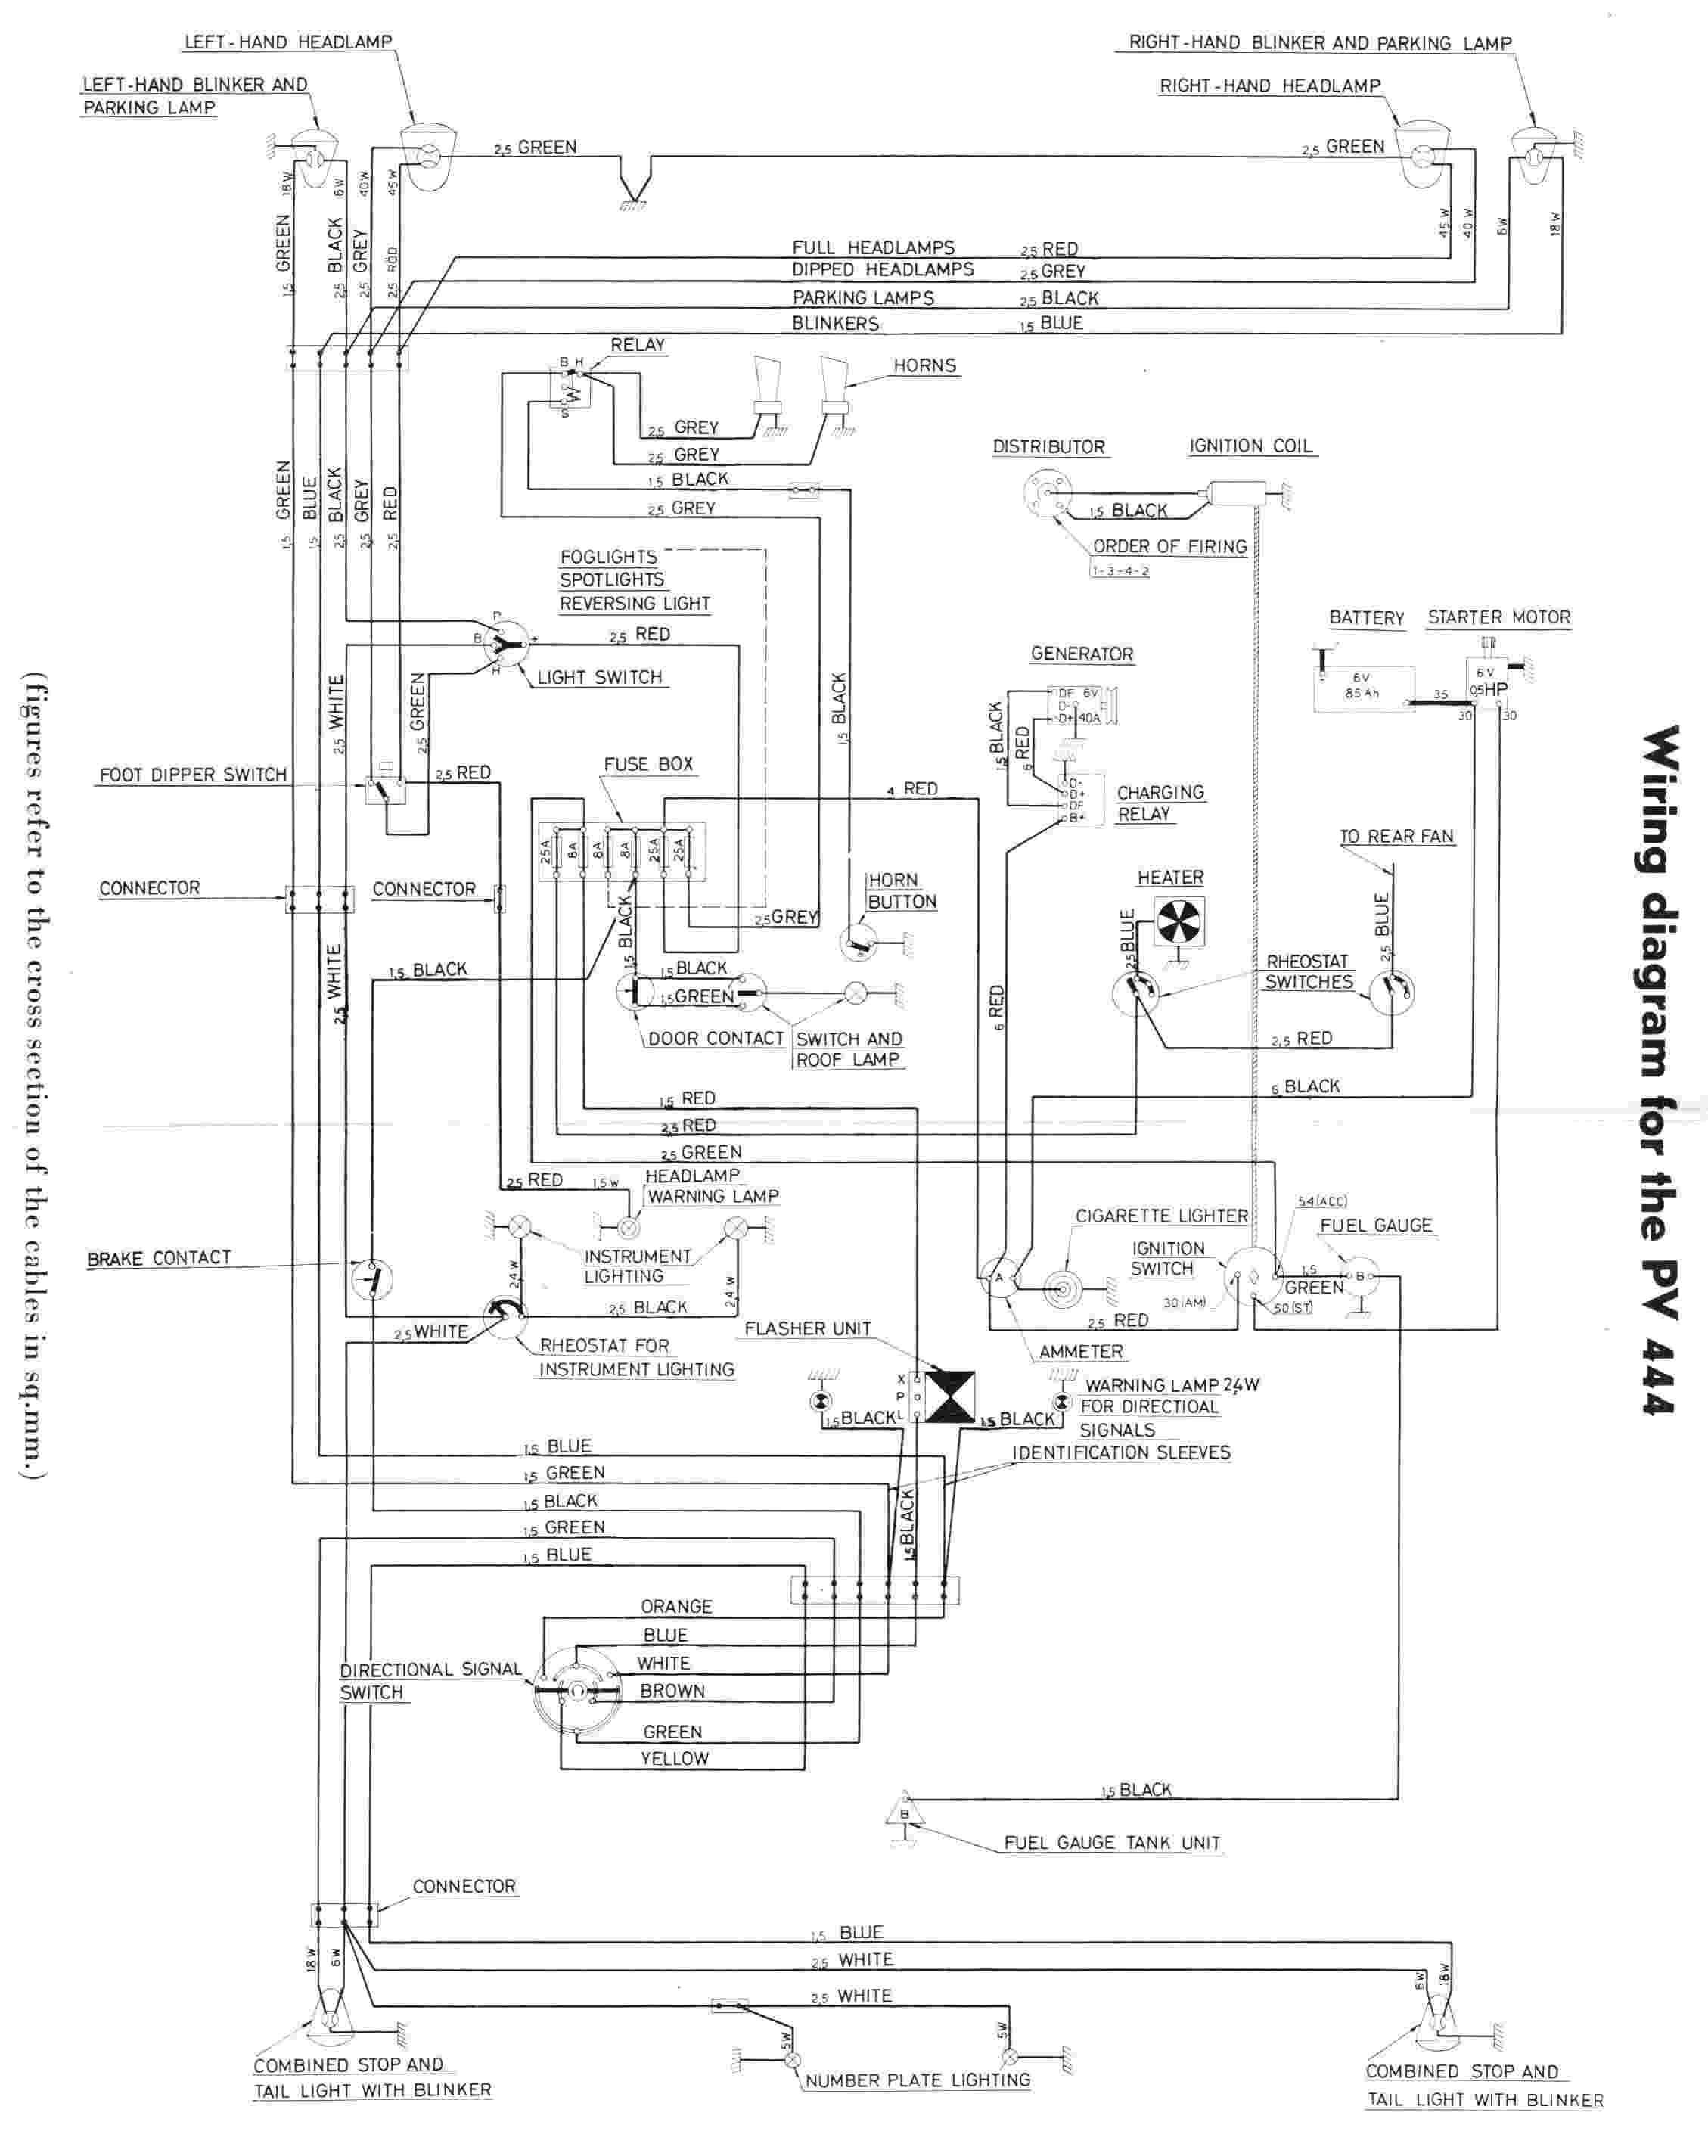 medium resolution of volvo ignition wiring diagram wiring diagram database rh 11 11 1 infection nl de volvo v70